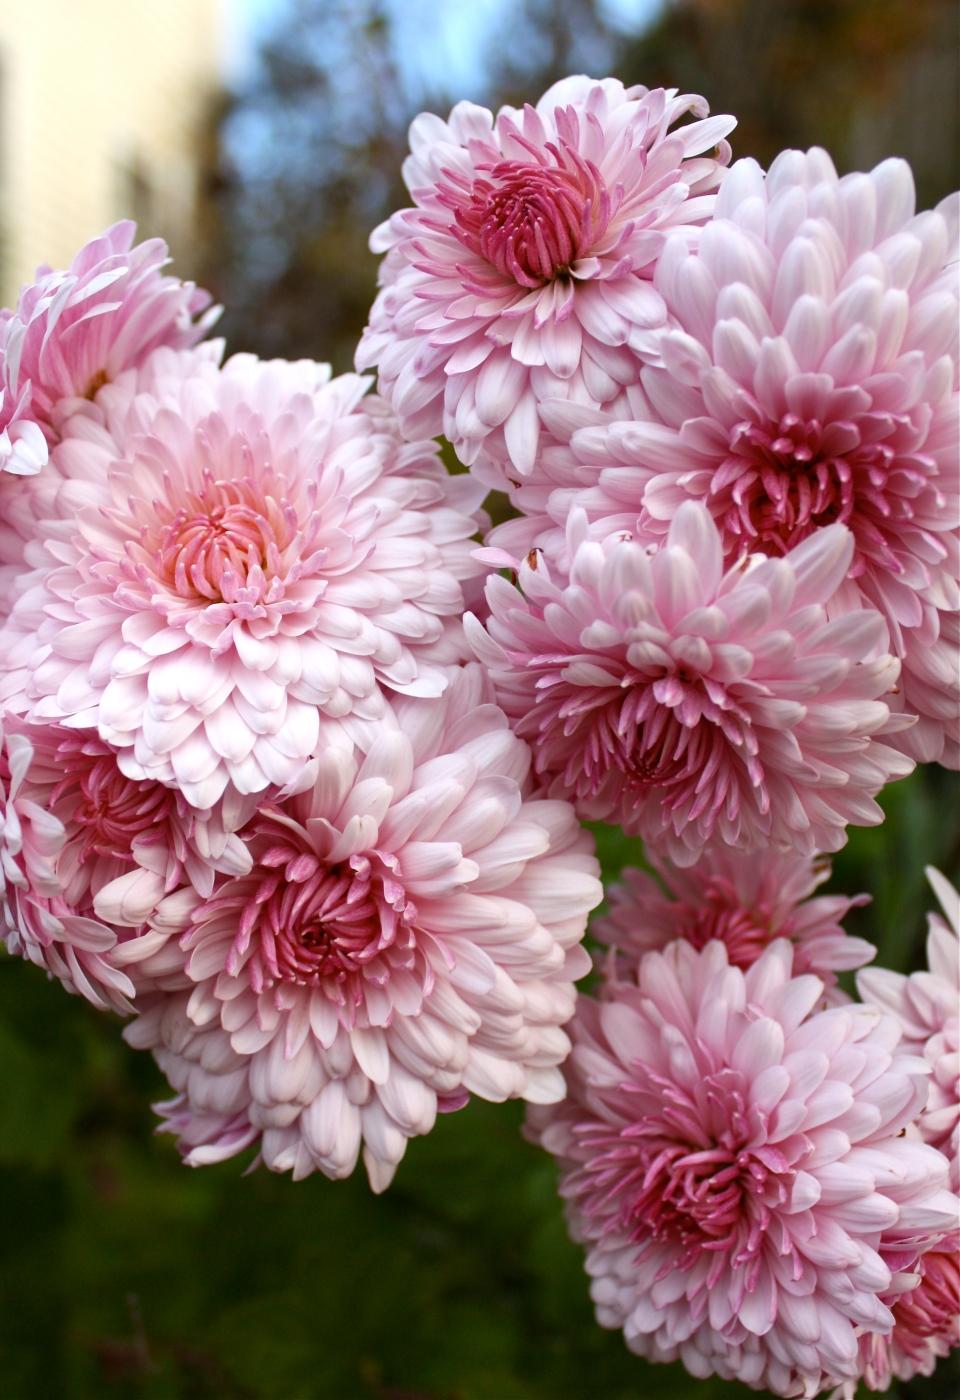 Emperor of China Chrysanthemum ©Kim Smith 2012